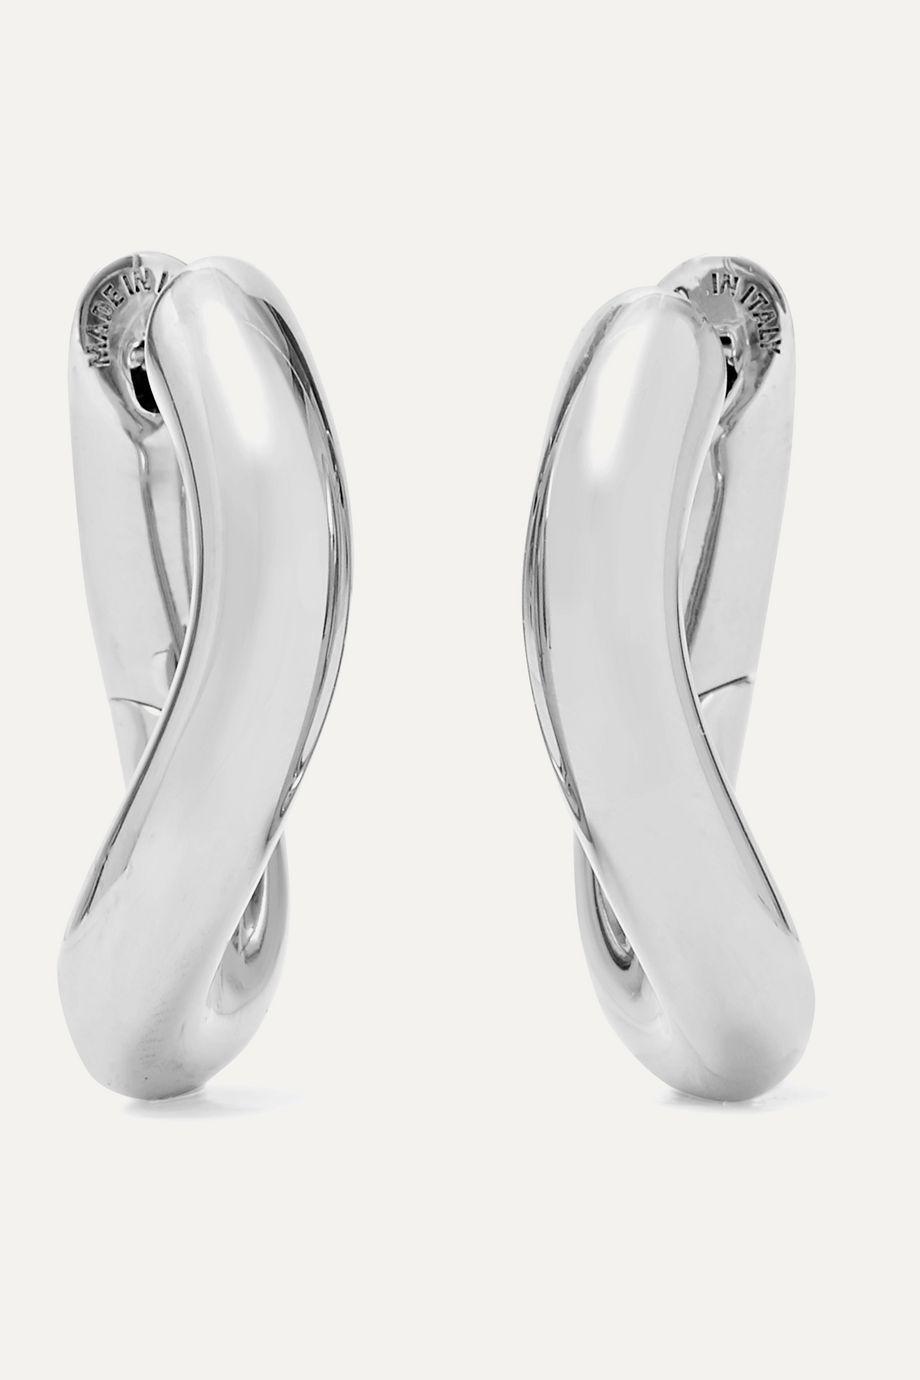 Balenciaga Loop XS silver-tone hoop earrings